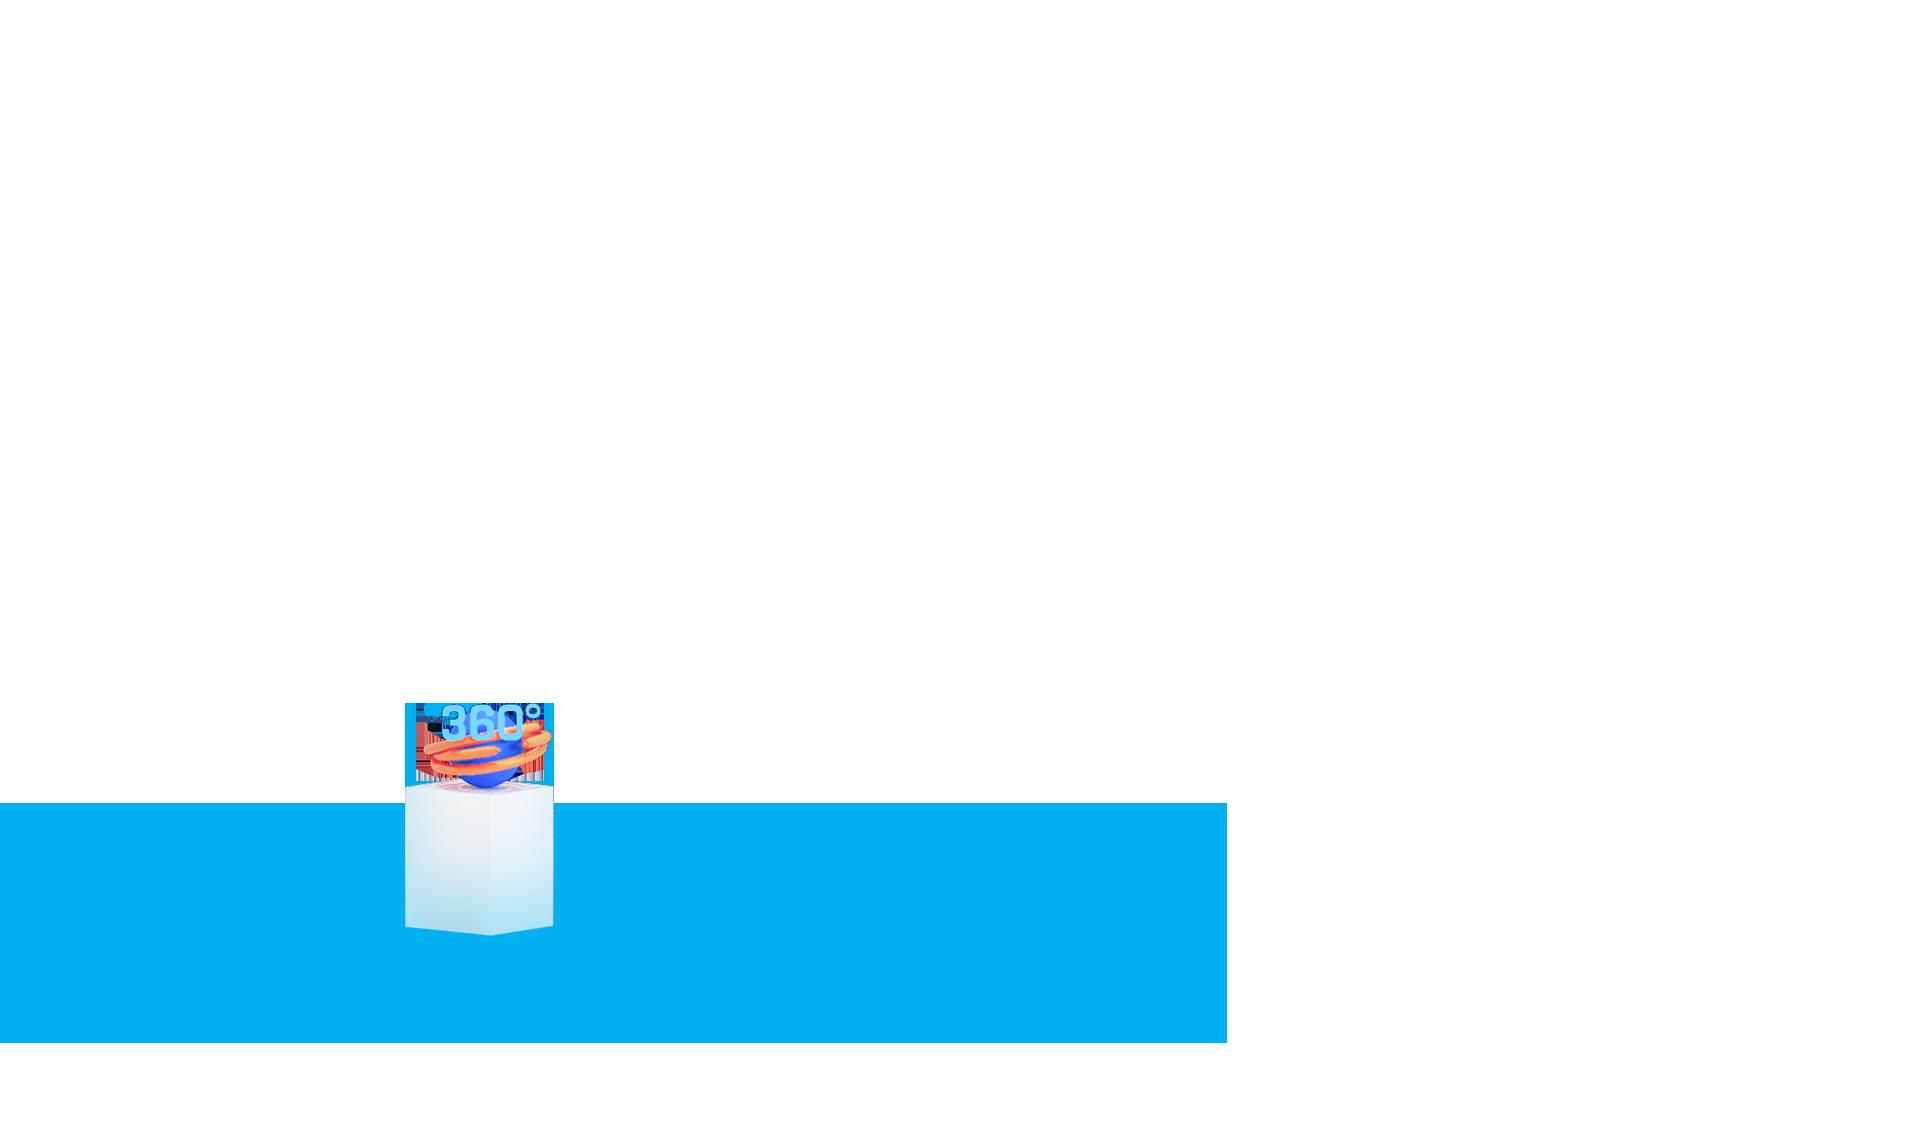 Stele mit 360 Grad Icon